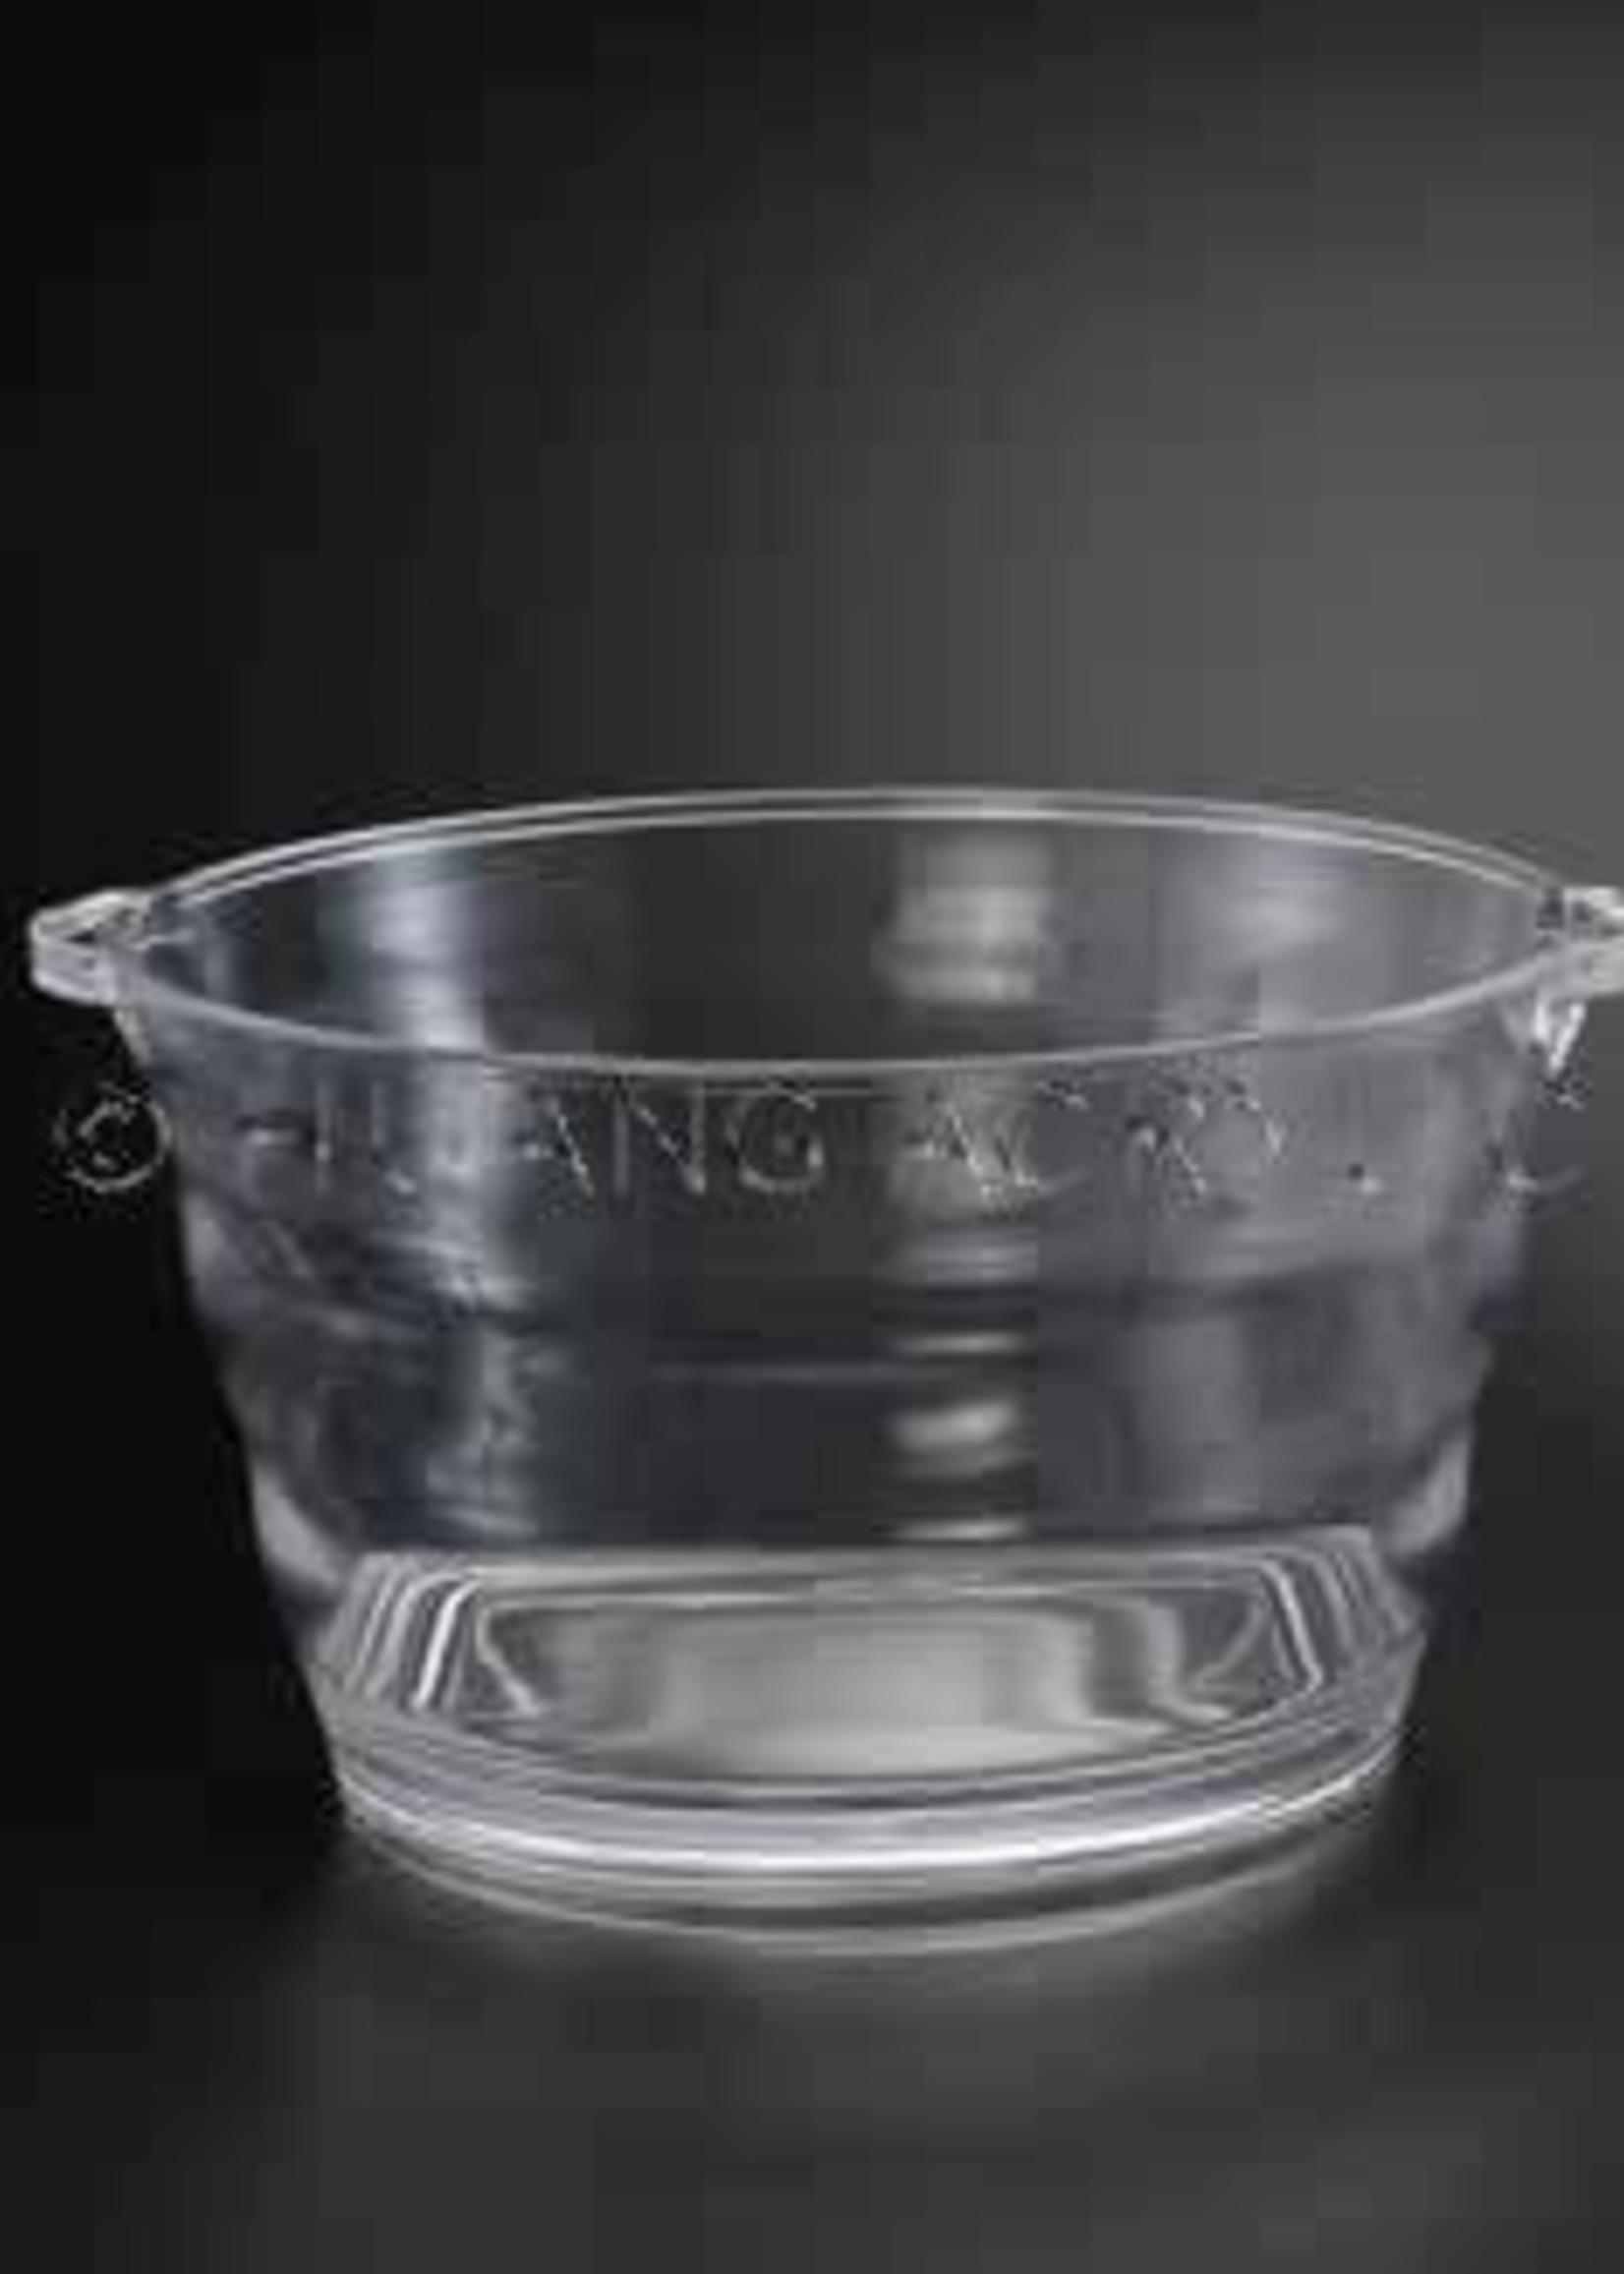 Heavy Jumbo 19.5 QT Oval Acrylic Bucket